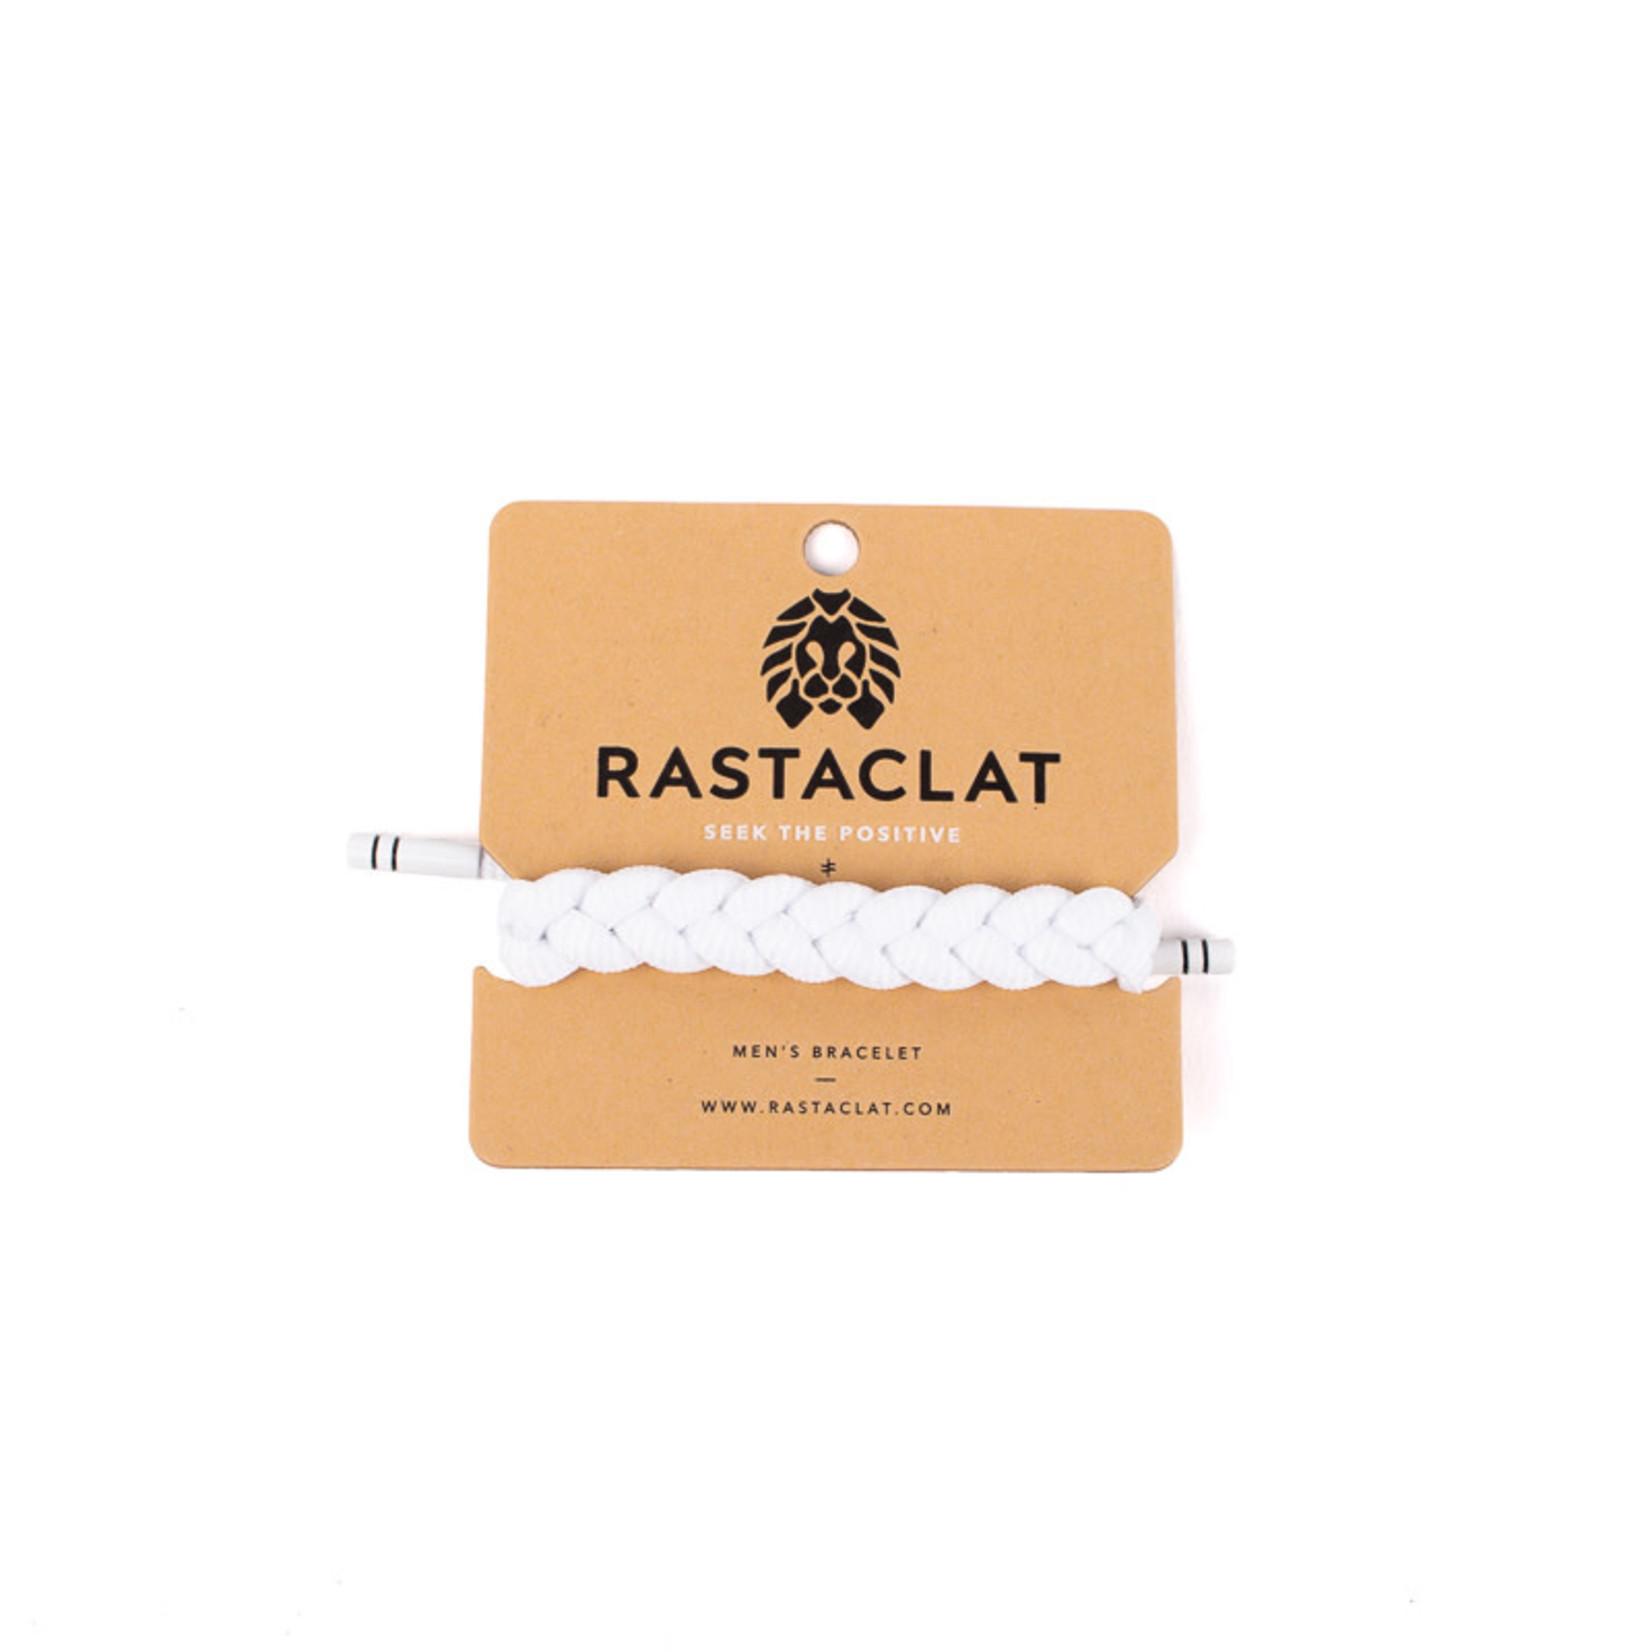 Rastaclat Rastaclat : Level 1 Custom Bracelet